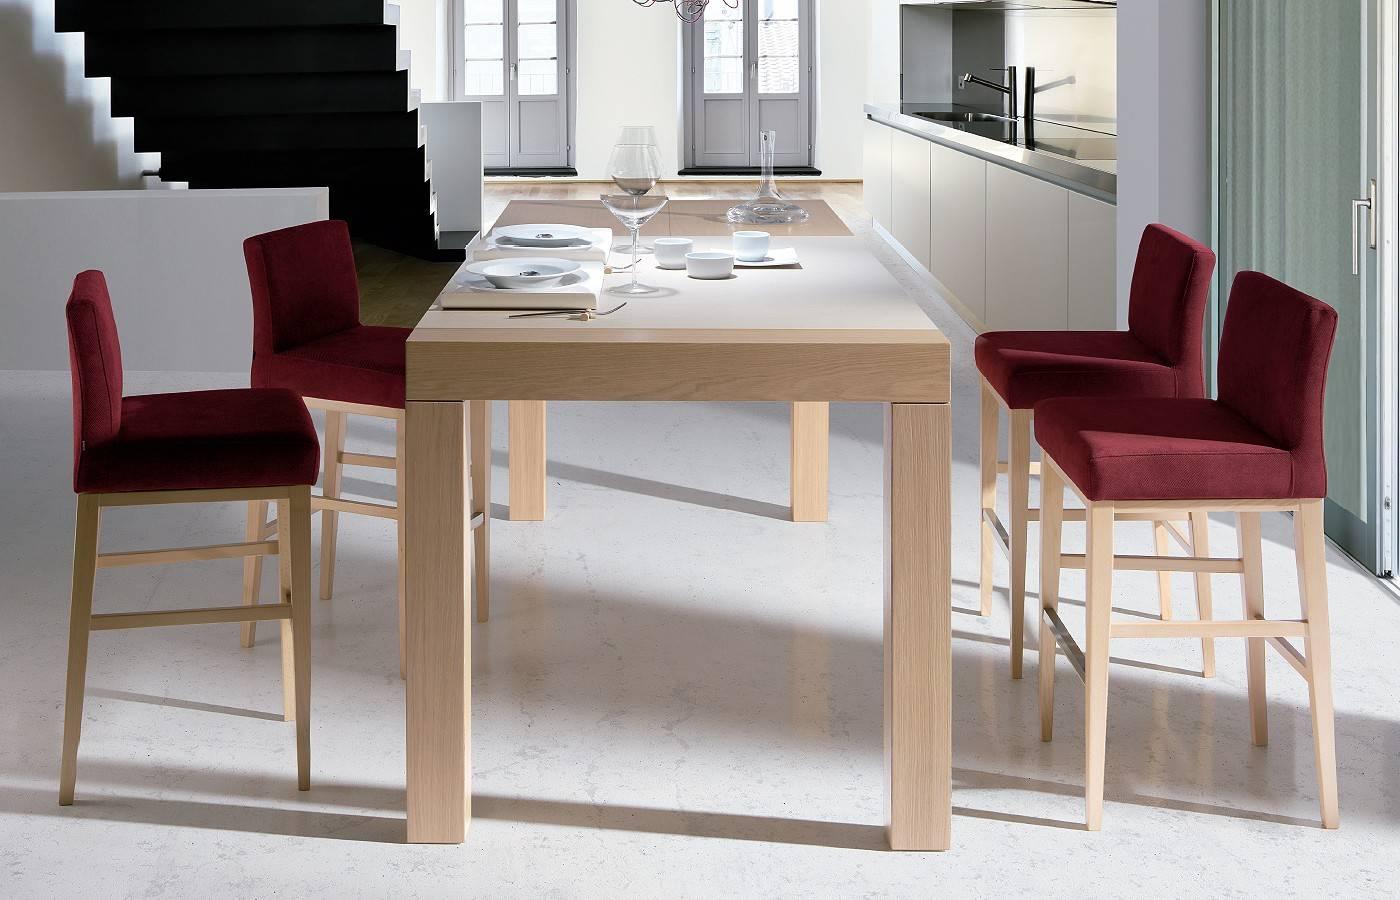 Mesa de comedor slatten multifunci n altura 90 dismobel for Mesas de comedor altas